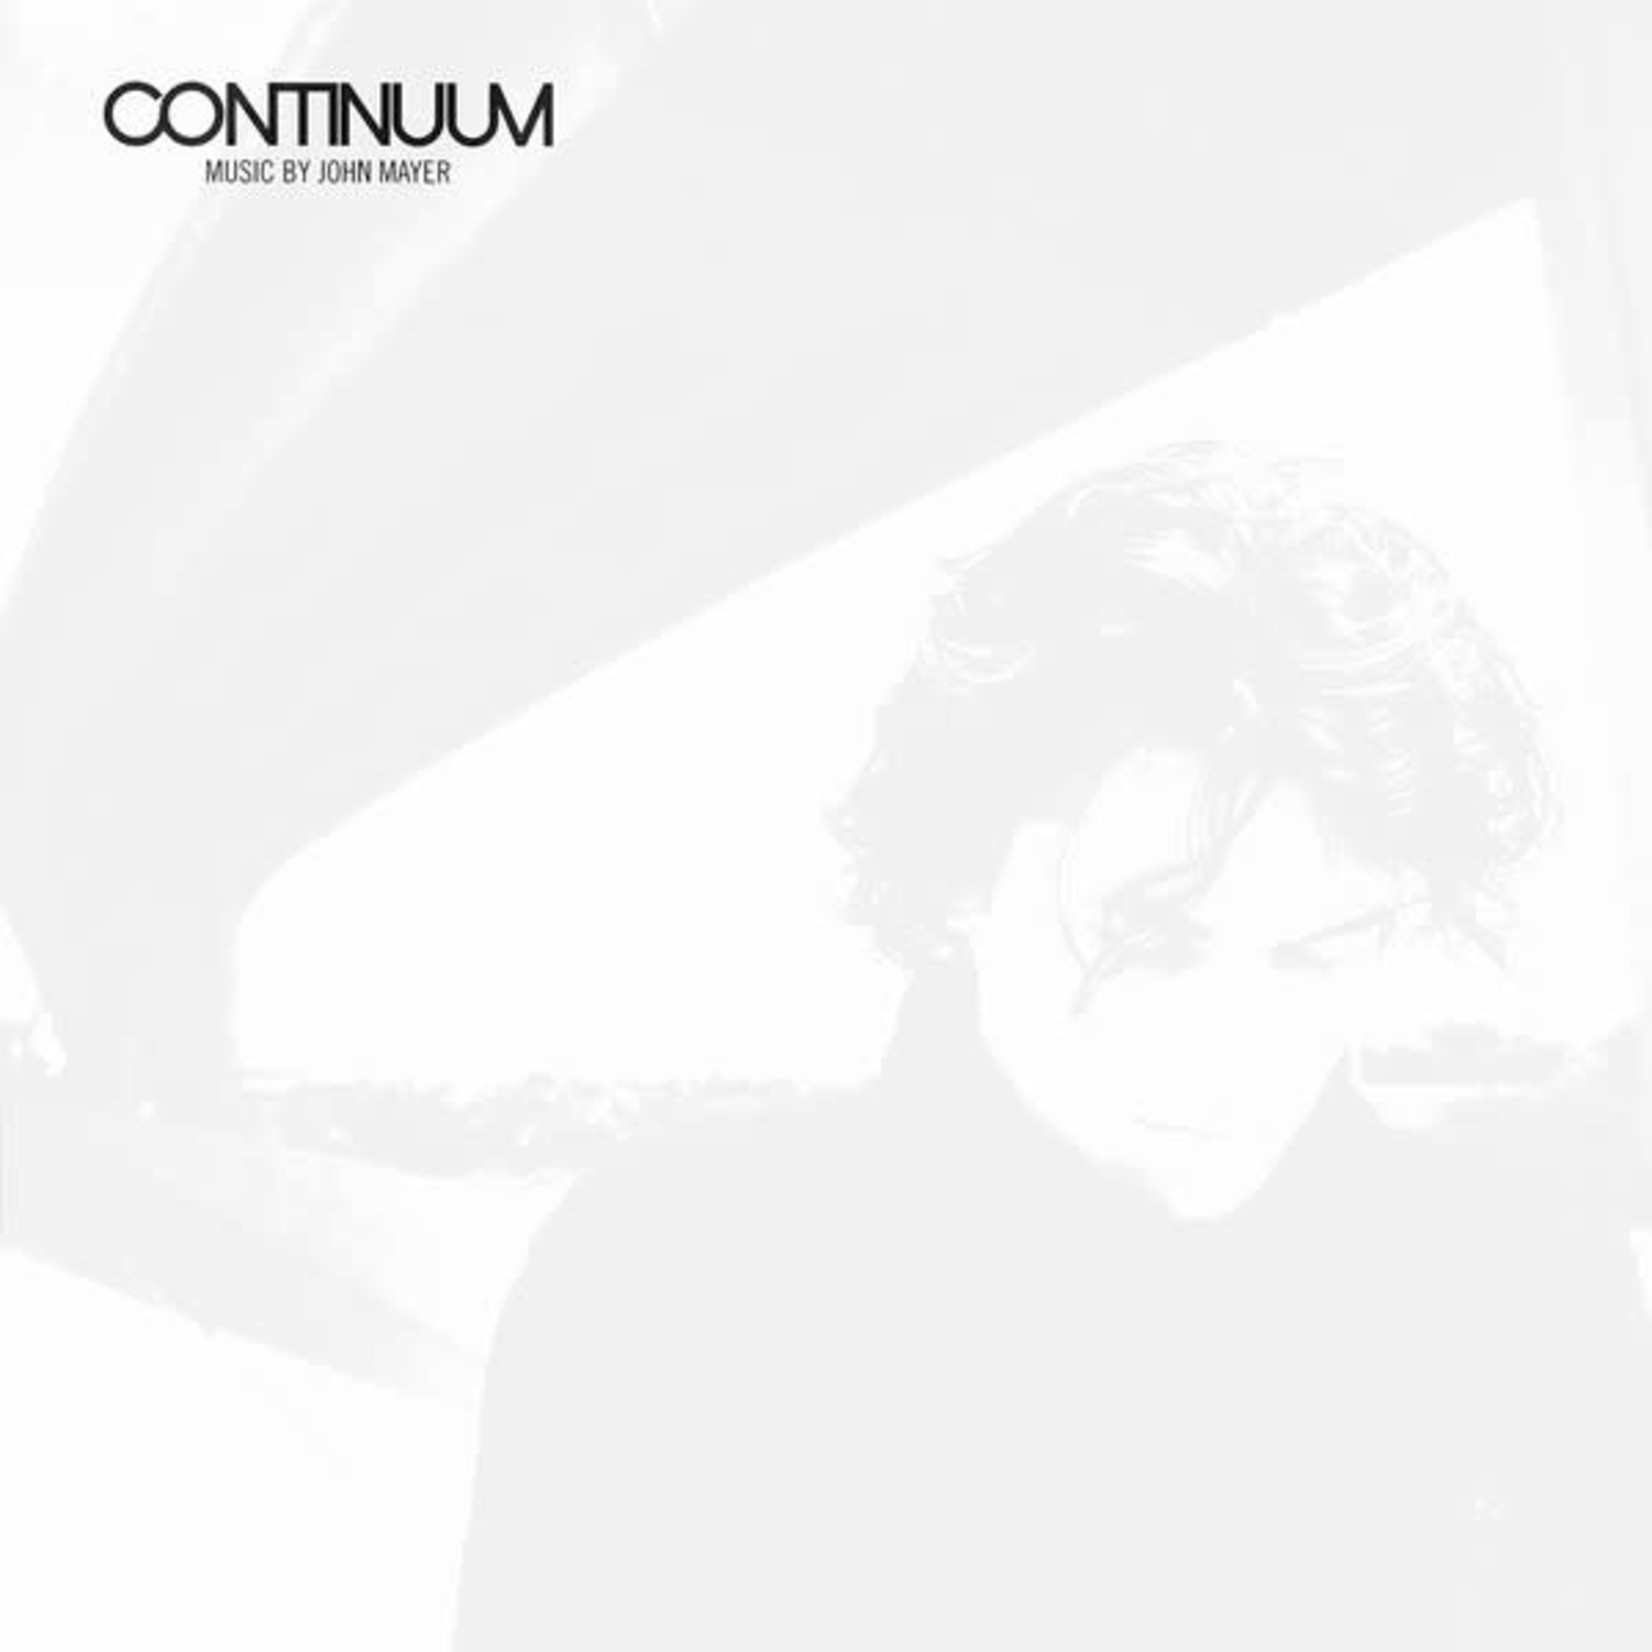 JOHN MAYER CONTINUUM 2 LP